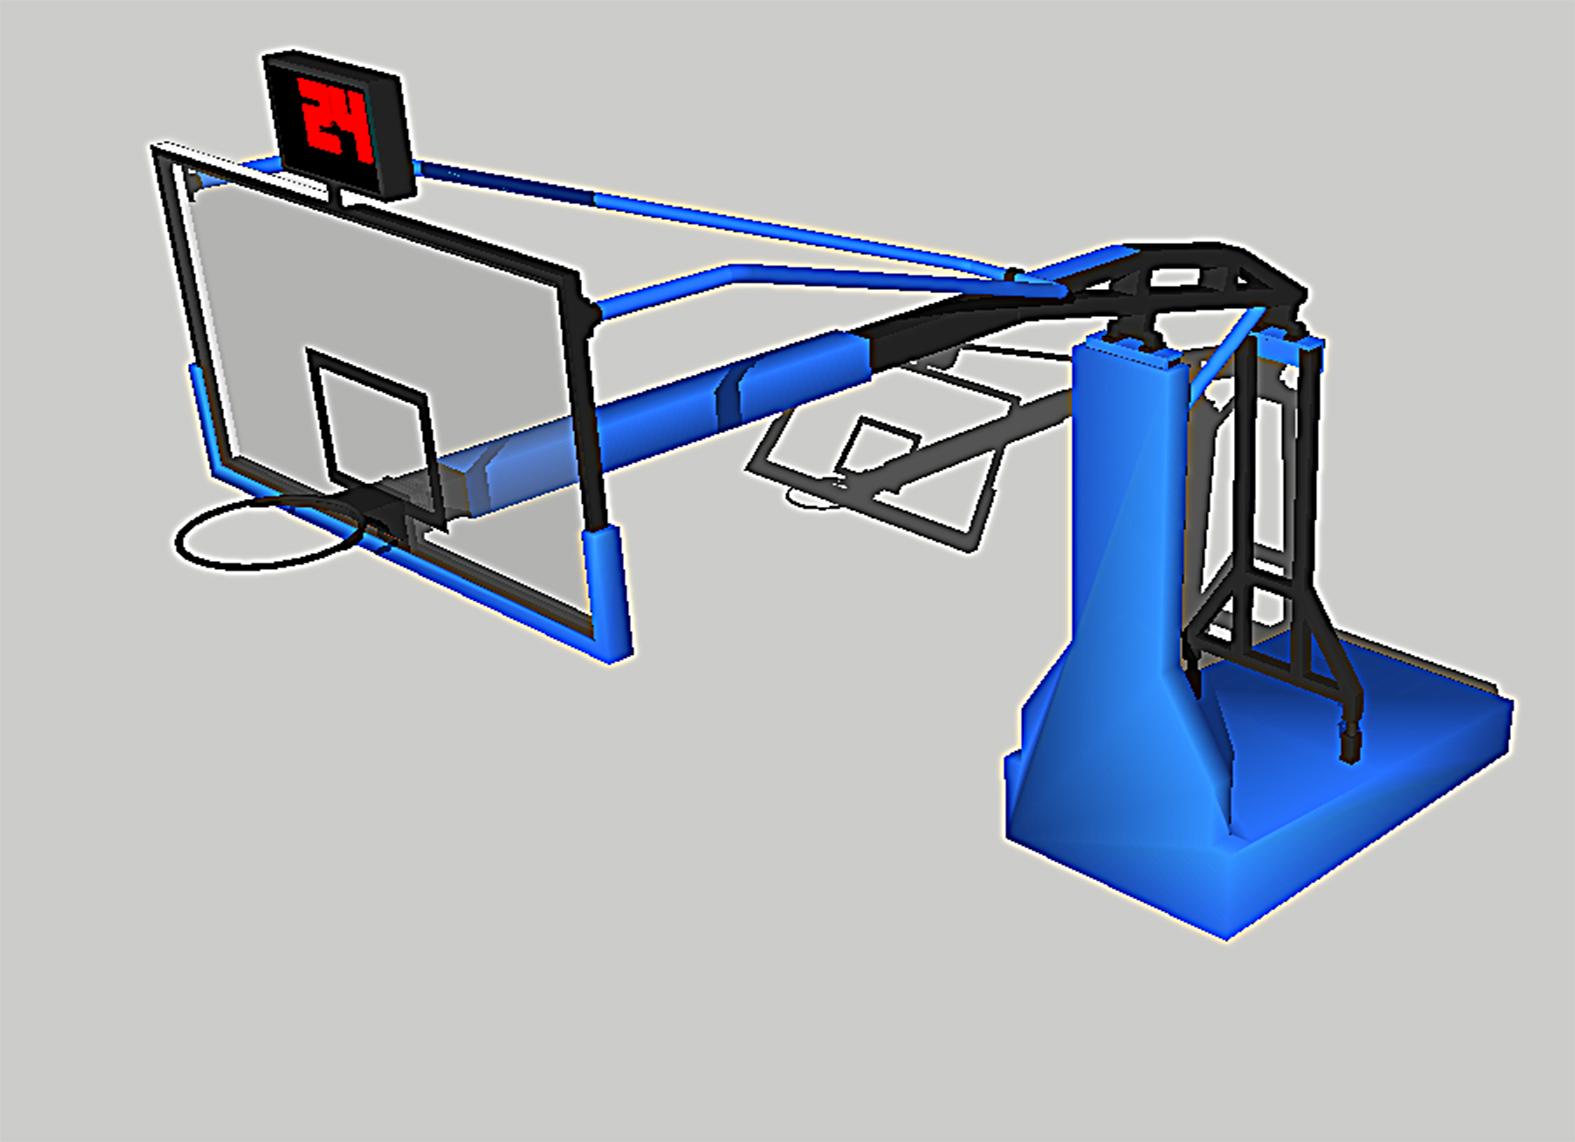 Basketball Hoop By Fp Creator Thingiverse Diagram Feb 27 2016 View Original